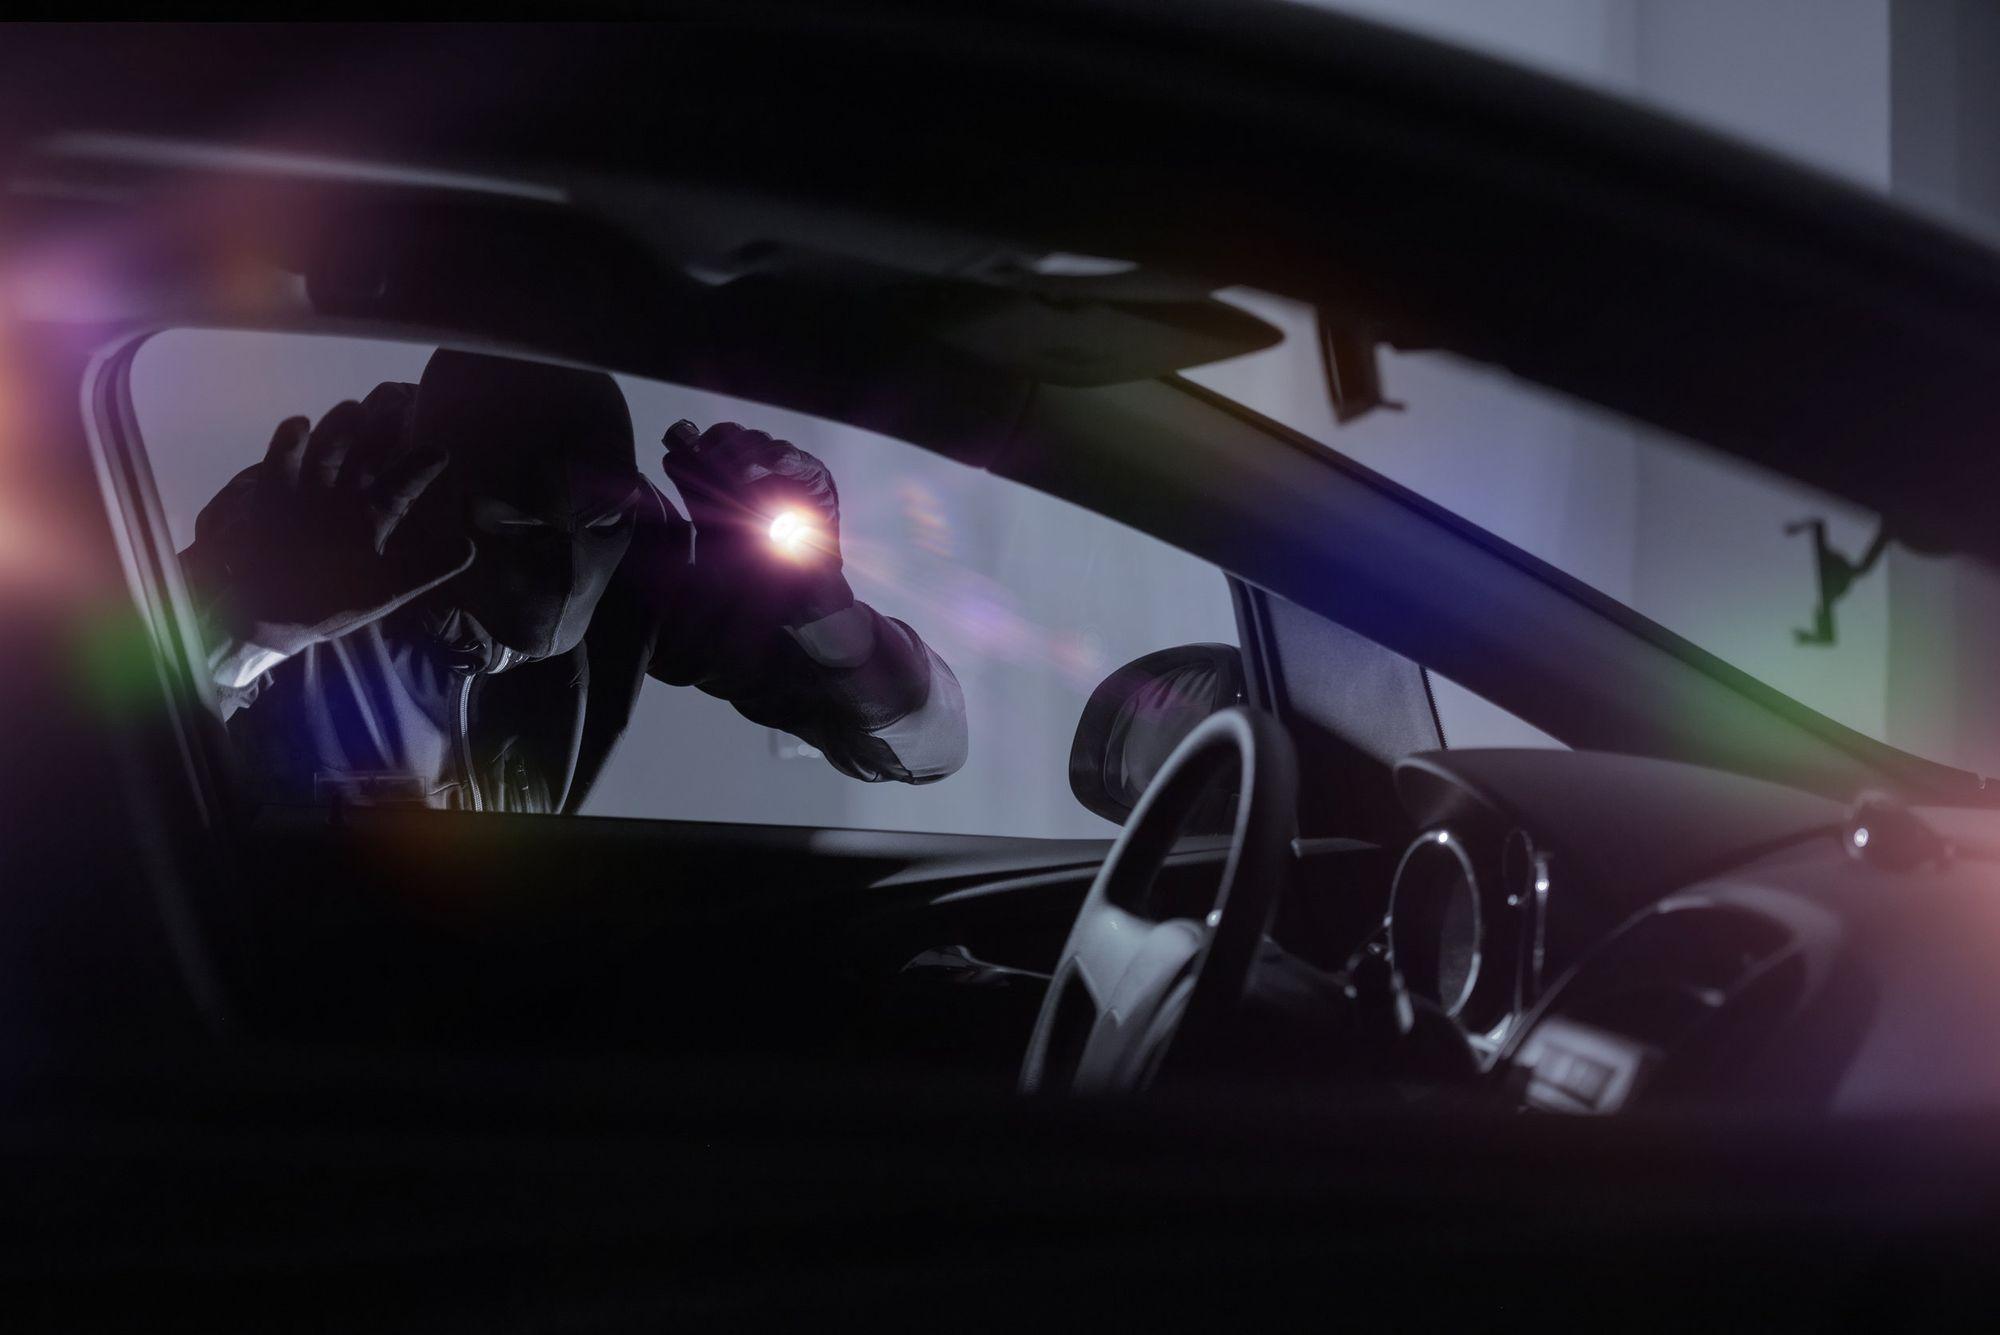 Como prevenir el robo de autos